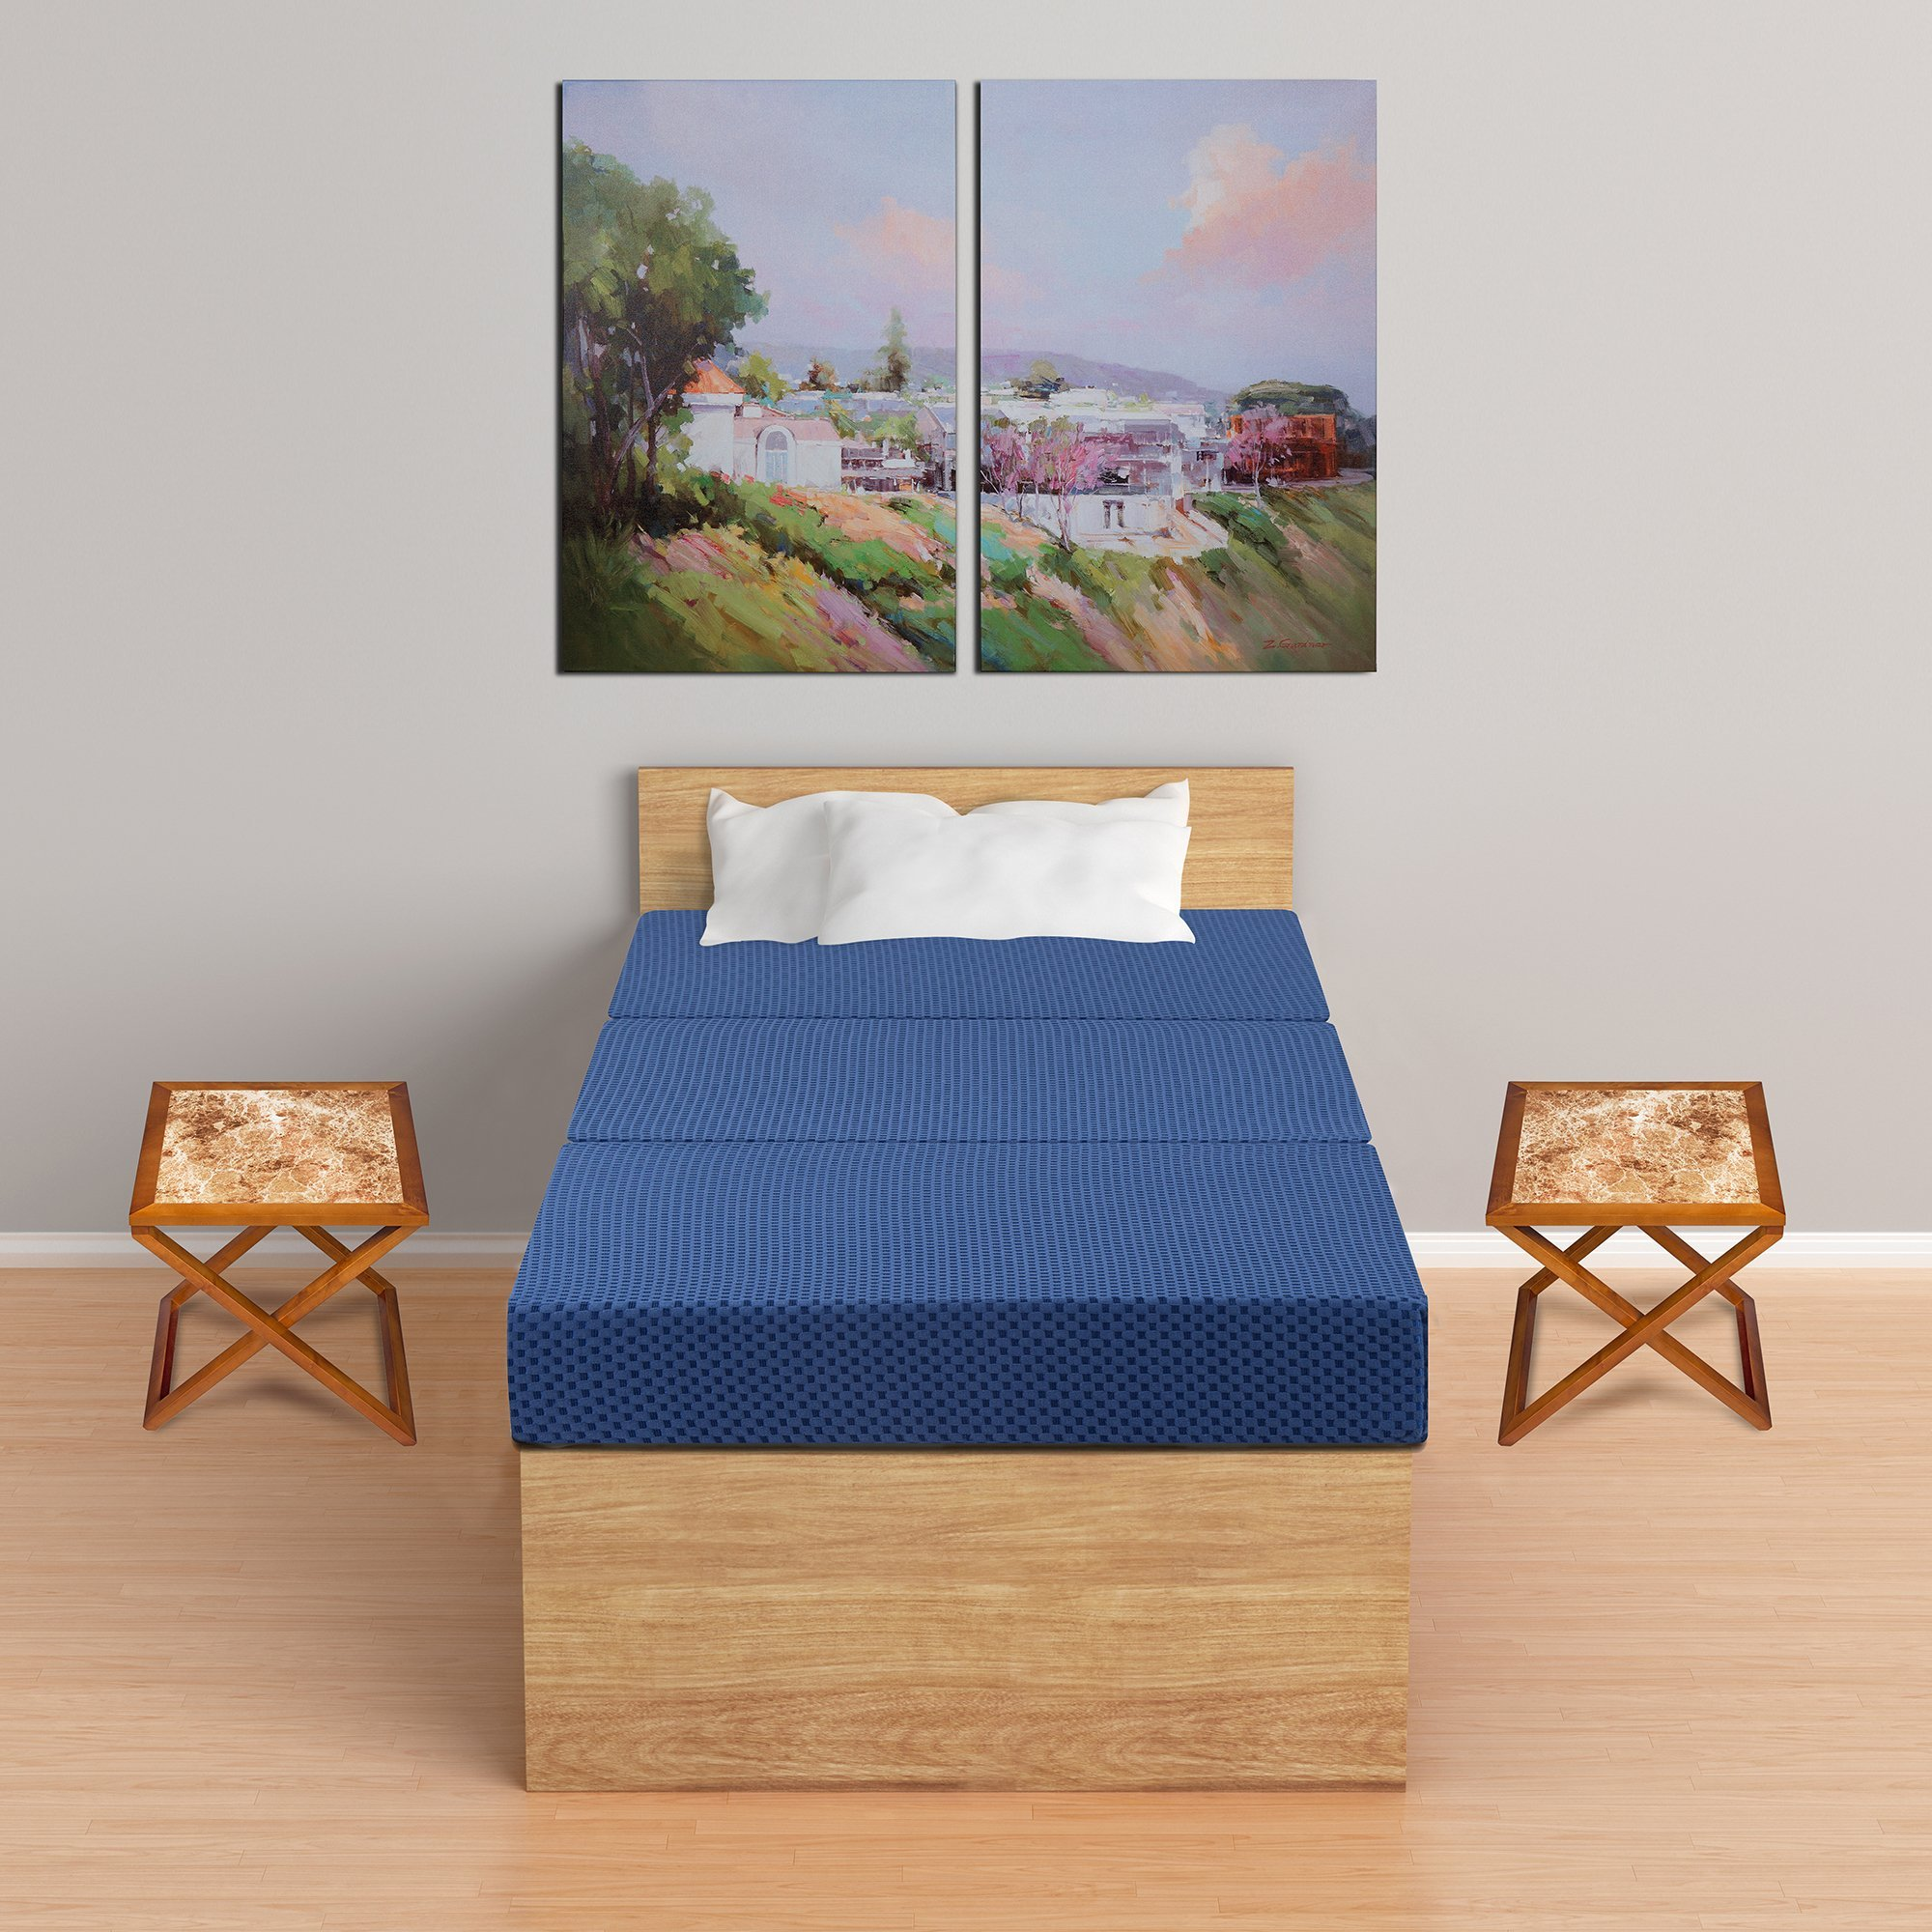 Primasleep Tri Fold Memory Foam Mattress Sofa Bed Guest